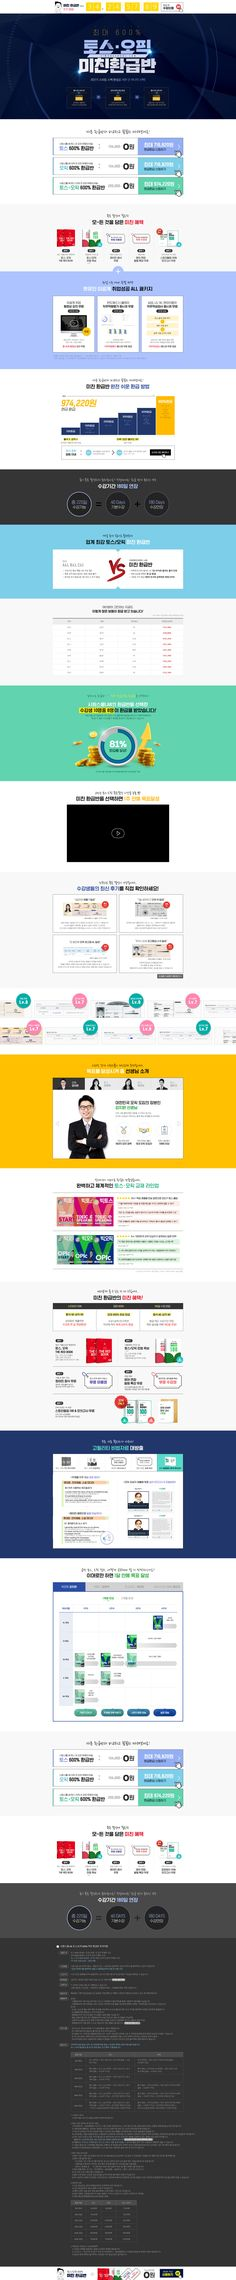 Page Design, Web Design, Promotional Design, Event Page, Event Design, Cool Designs, Banner, Layout, Marketing